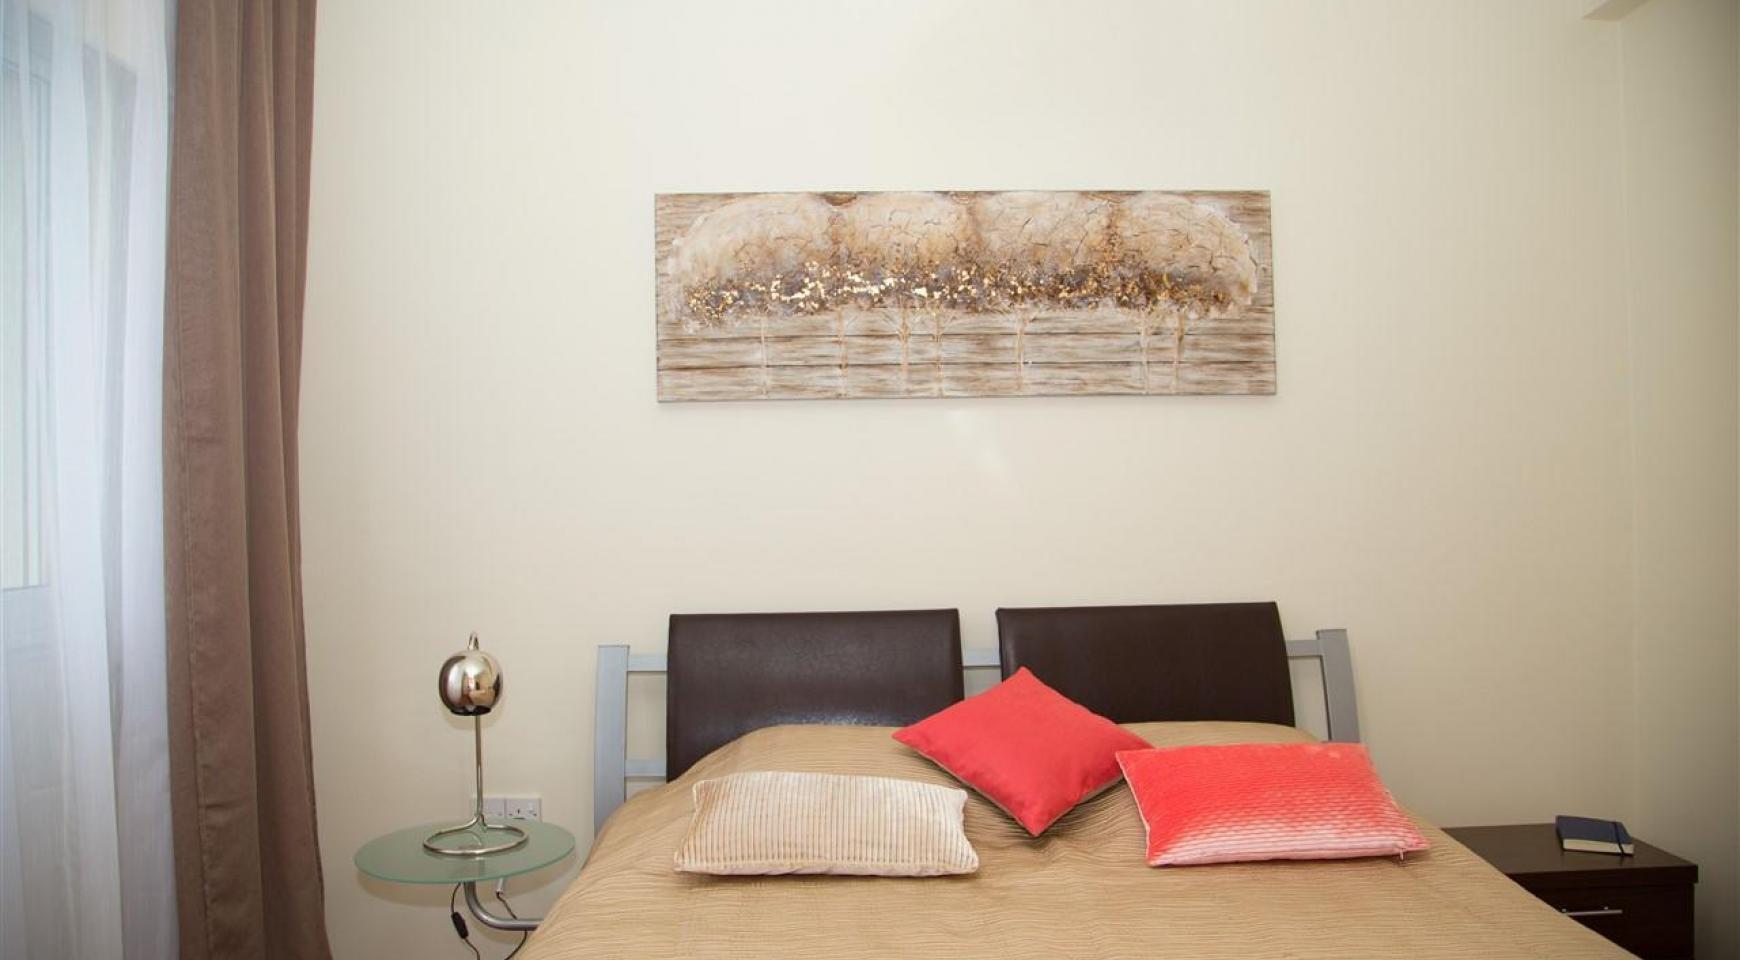 Luxury 2 Bedroom Apartment Mesogios Iris 304 in the Tourist area near the Beach - 20